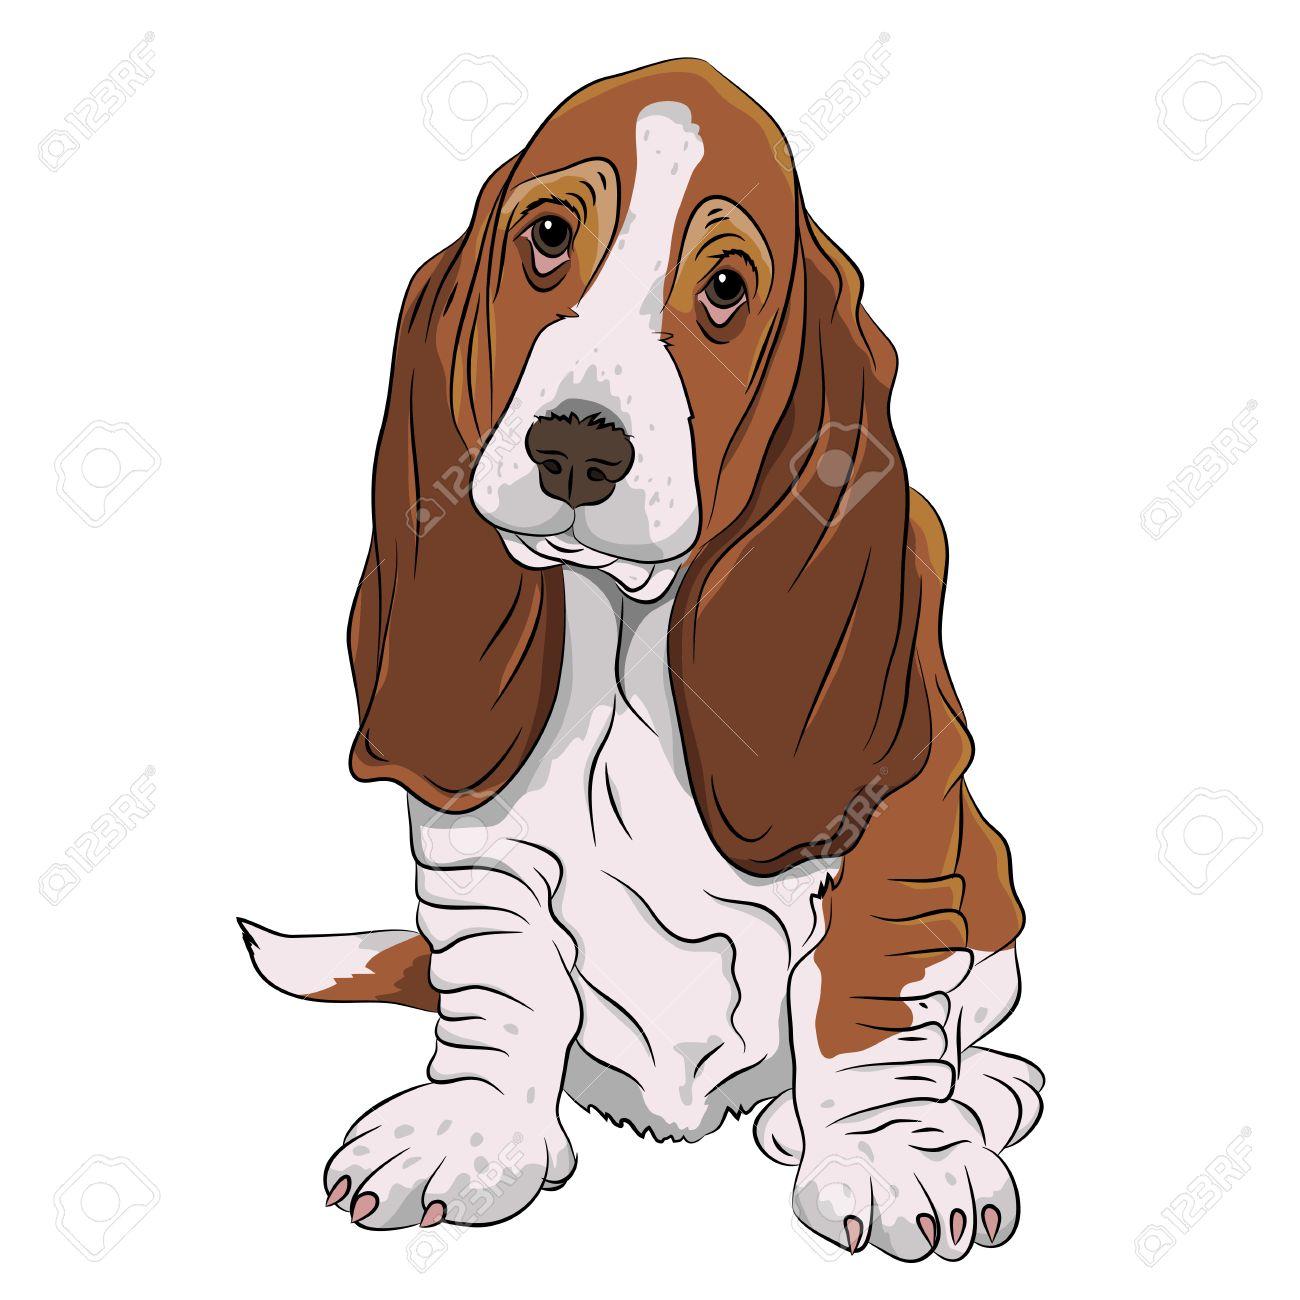 Basset hound clipart 9 » Clipart Station.